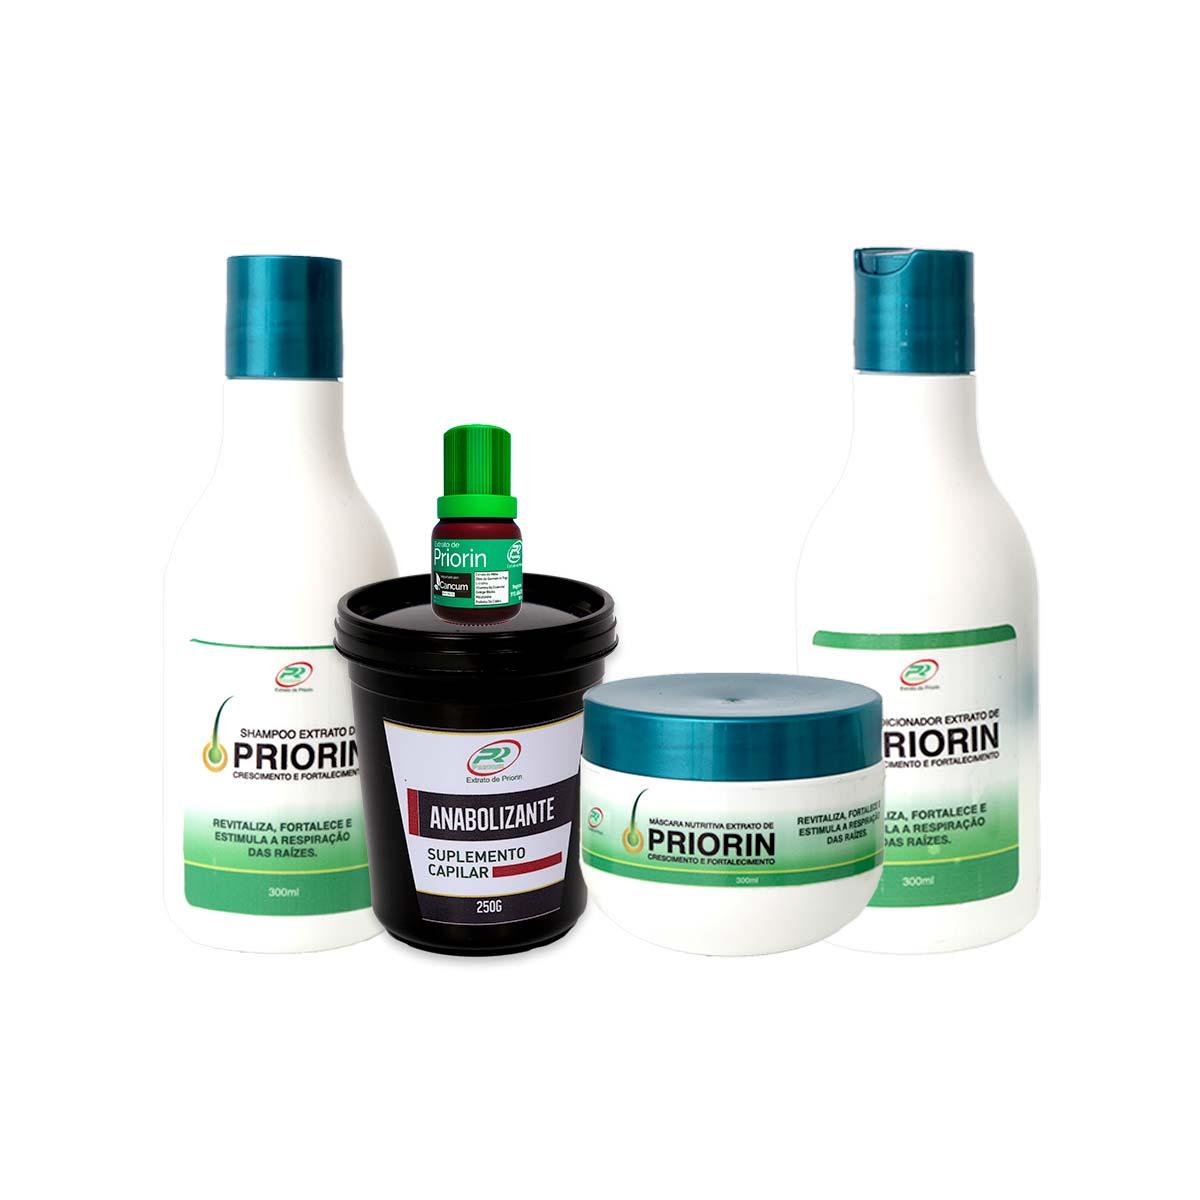 1 Tônico Capilar (cresce cabelo) + Shampoo e Condicionador + Máscara Nutritiva + Anabolizante 250g